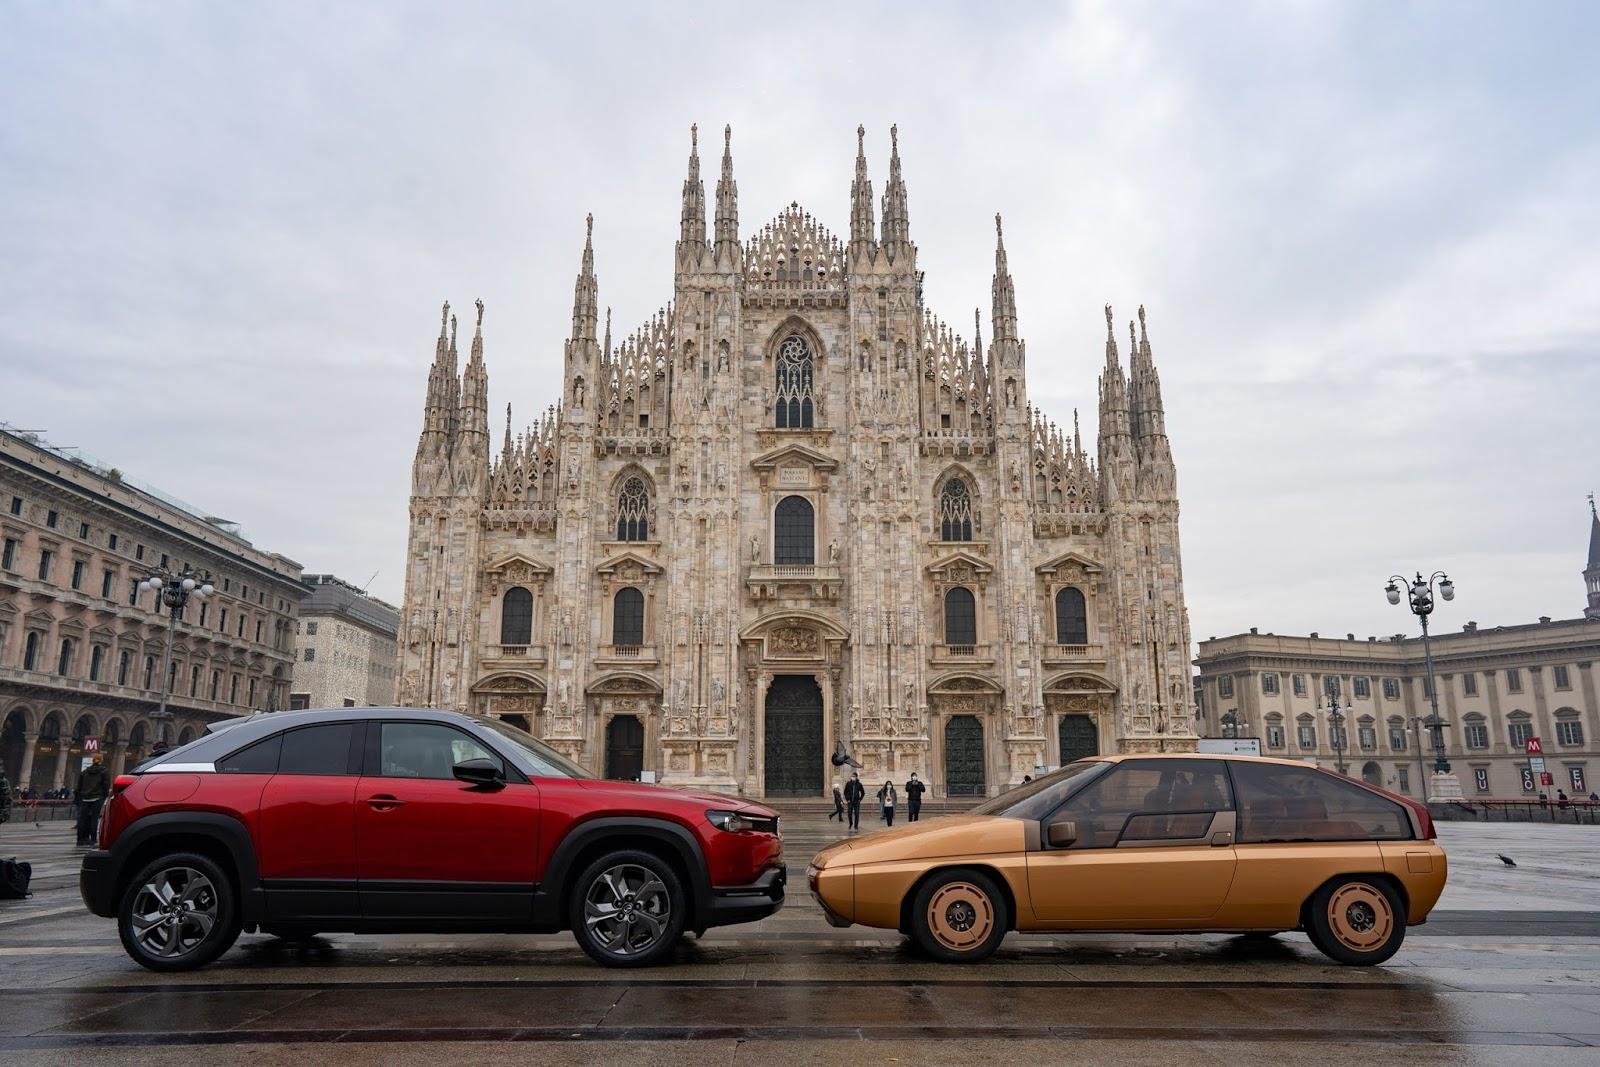 Mazda MX 81 Mazda MX 30 2020 hires 5 1 60 χρόνια Ιταλικής επιρροής στο Design της Mazda